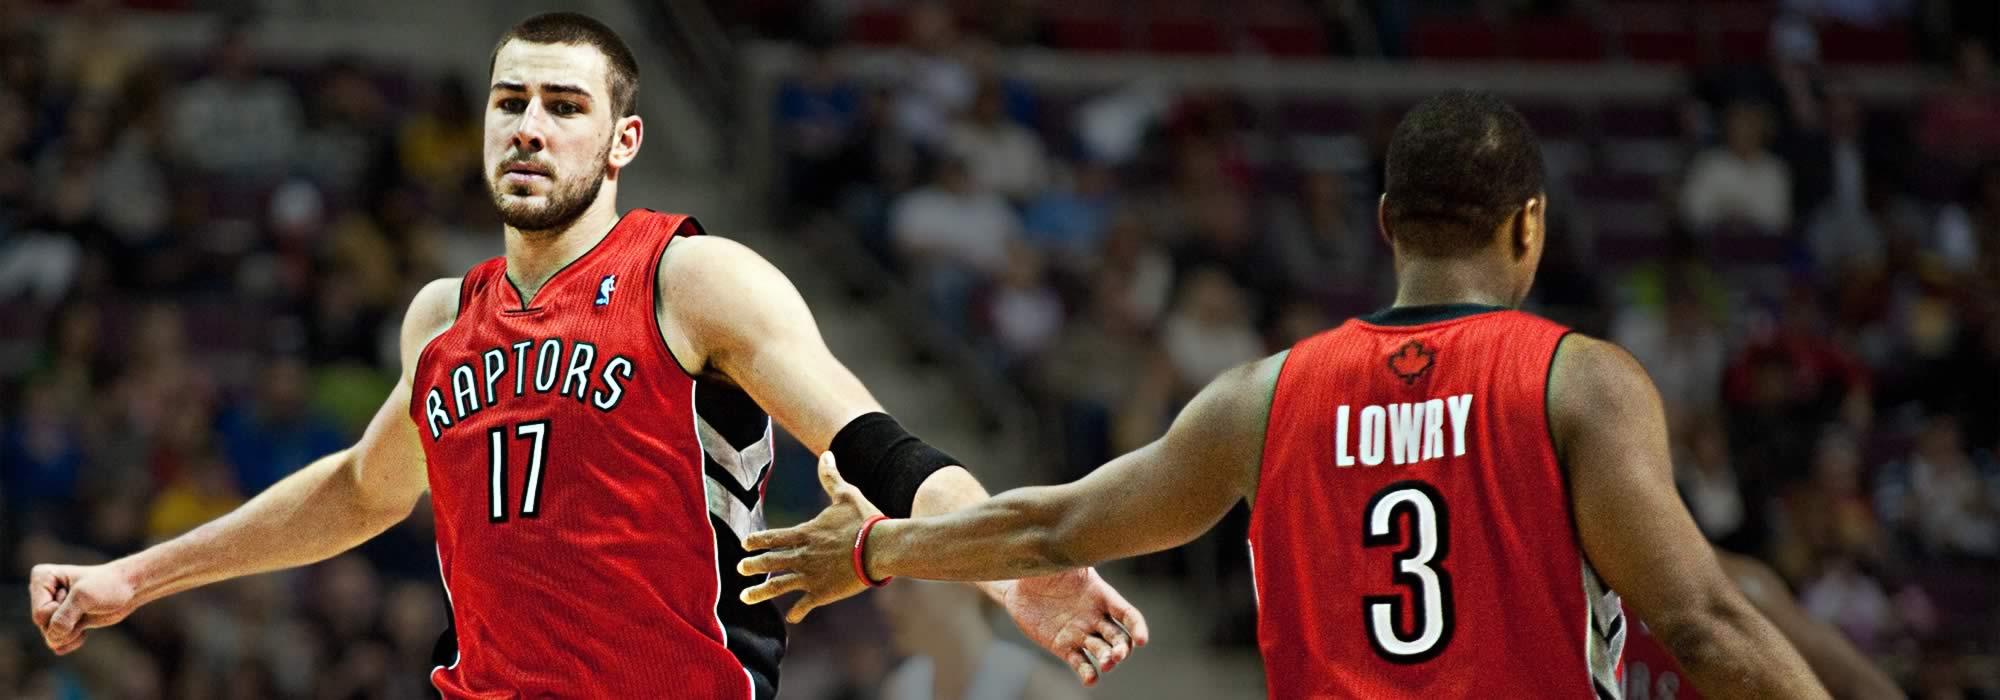 2013-14 NBA Preview - SBNation com